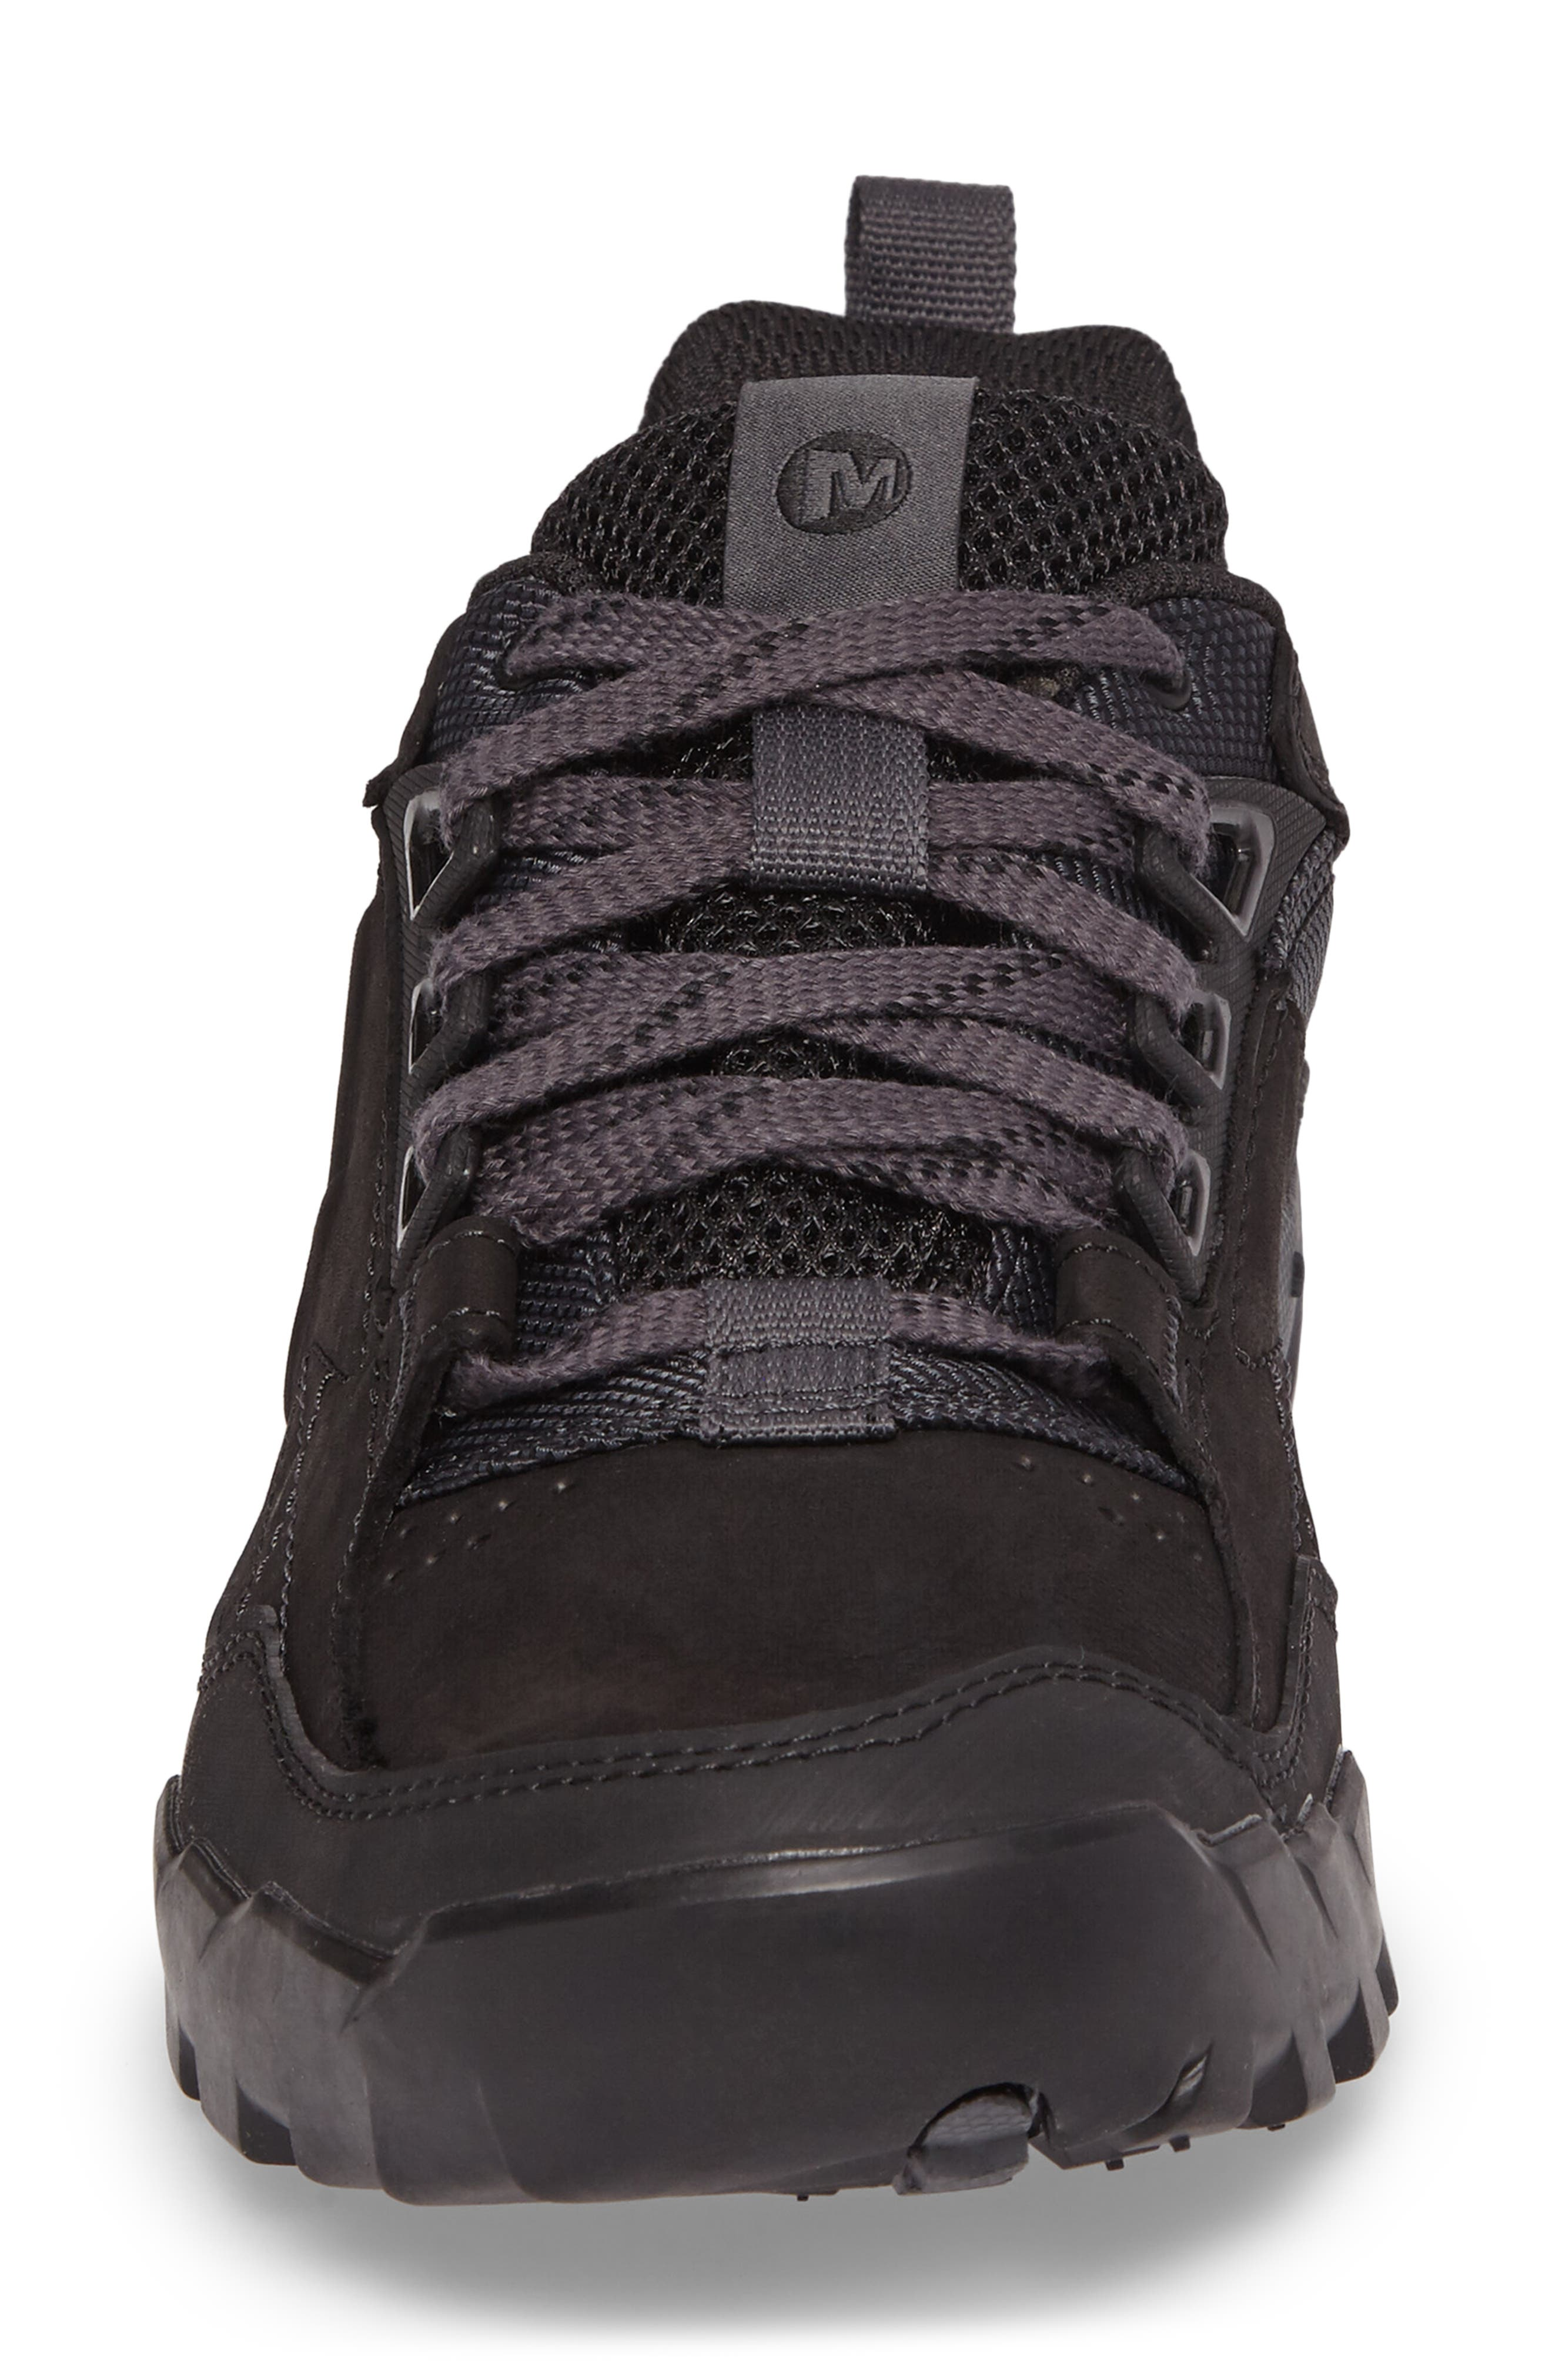 Annex Tak Low Hiking Shoe,                             Alternate thumbnail 4, color,                             BLACK NUBUCK LEATHER